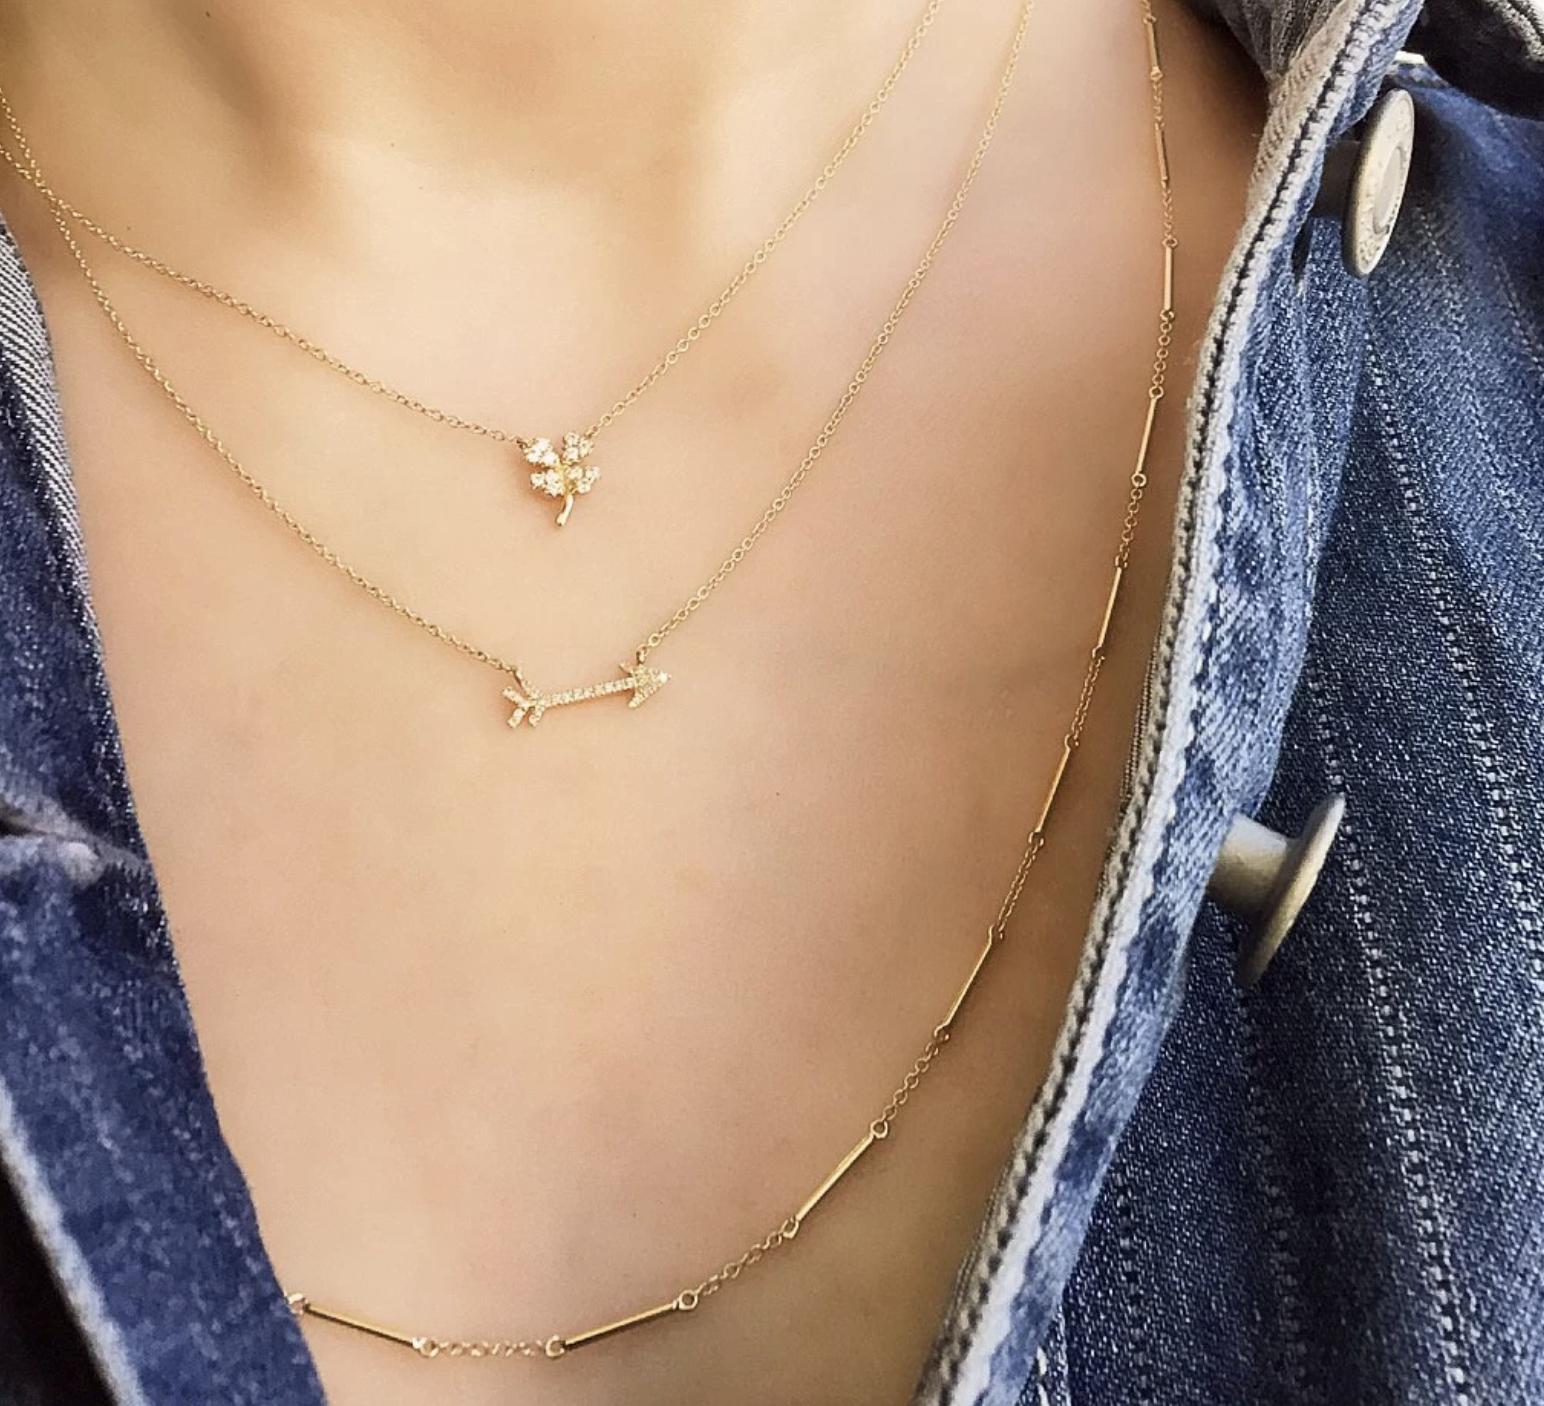 Unity Rose Gold Necklace With Single Bezel Diamond